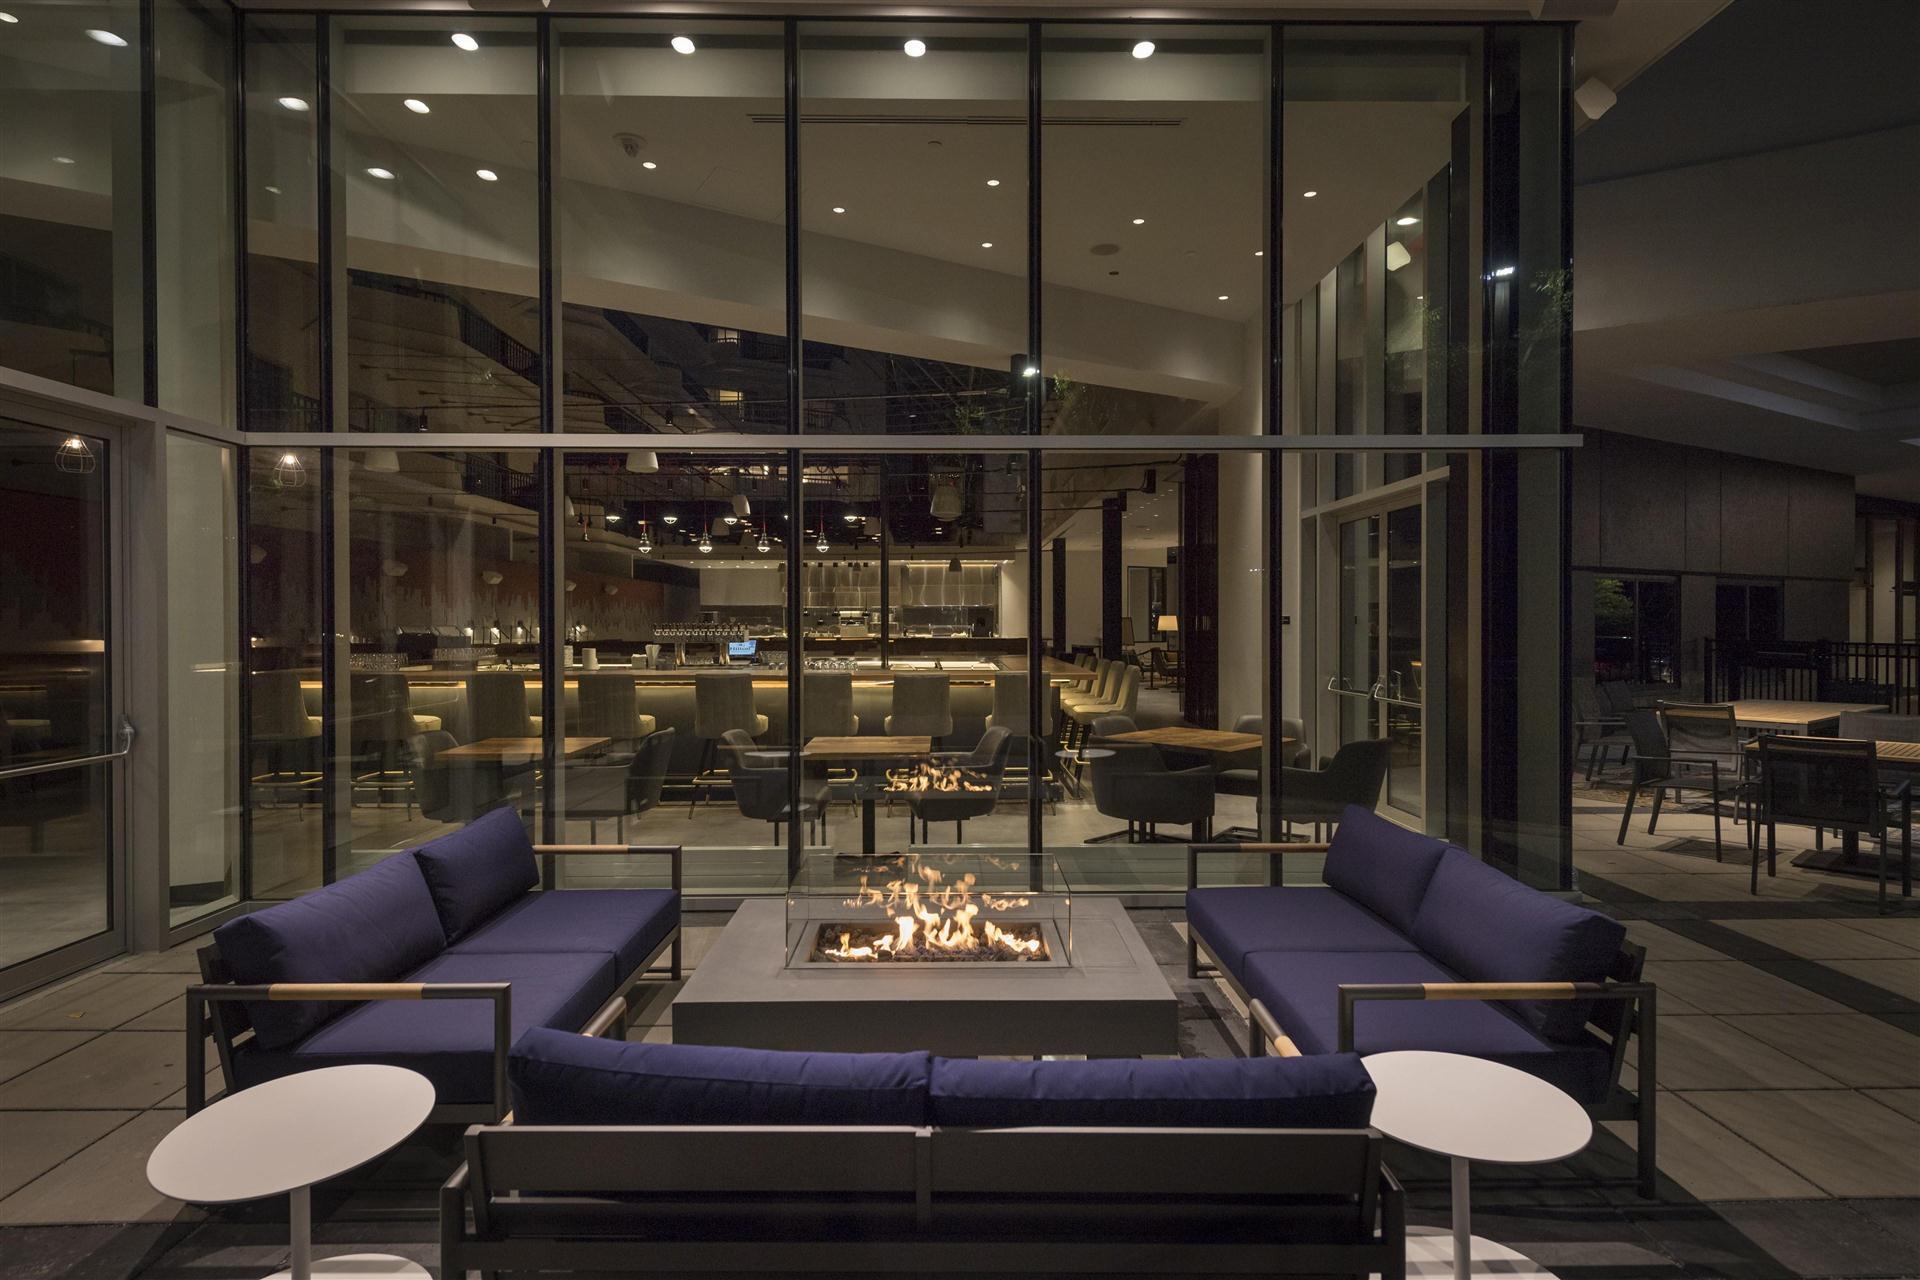 Meetings and Events at Hilton Boston/Woburn, Woburn, MA, US